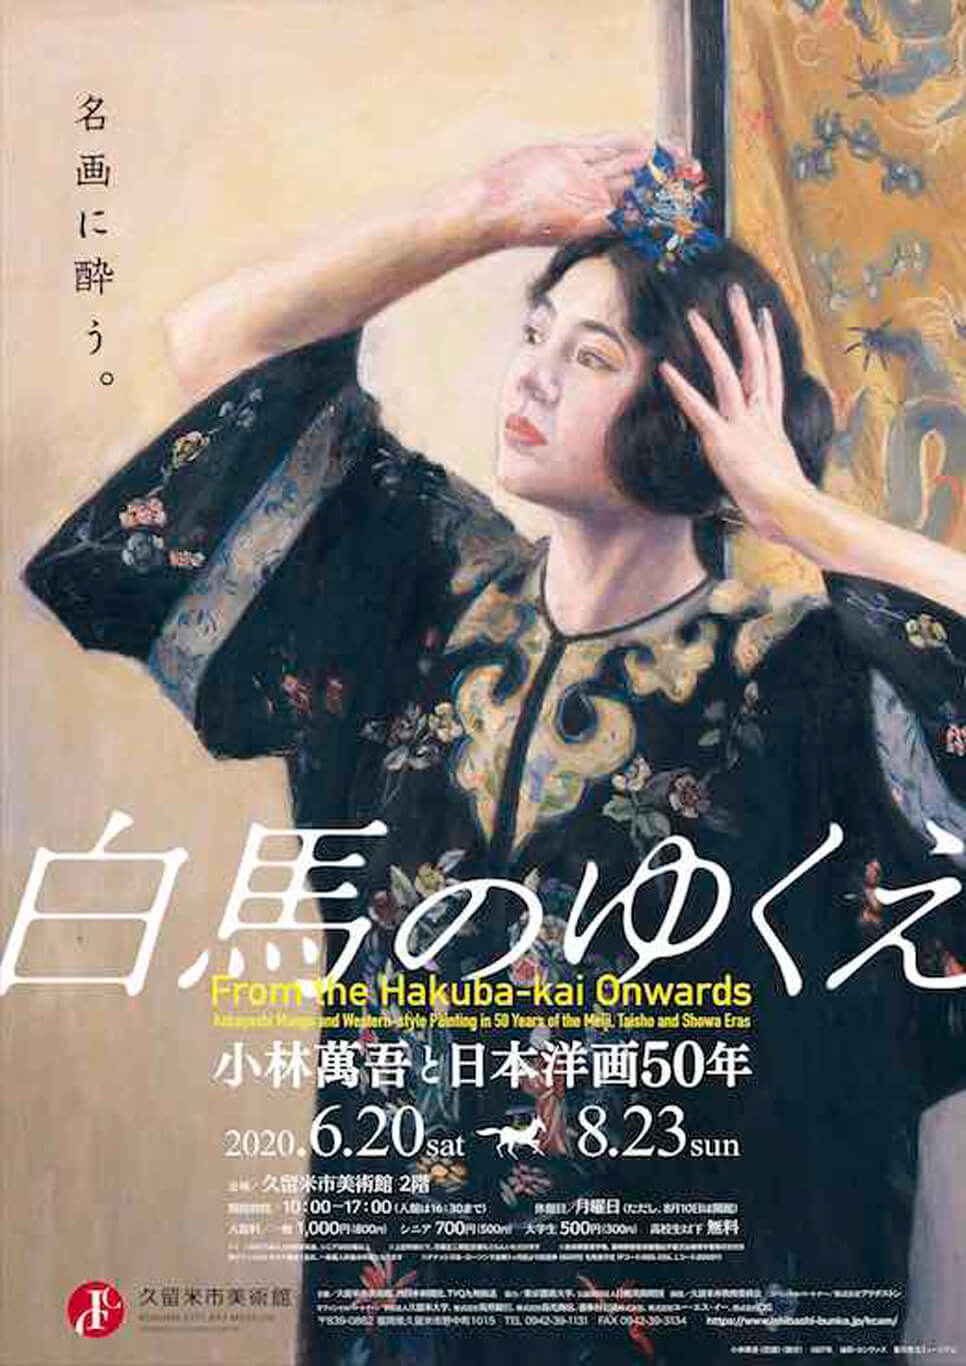 kcam-202006-白馬のゆくえ 小林萬吾と日本洋画50年